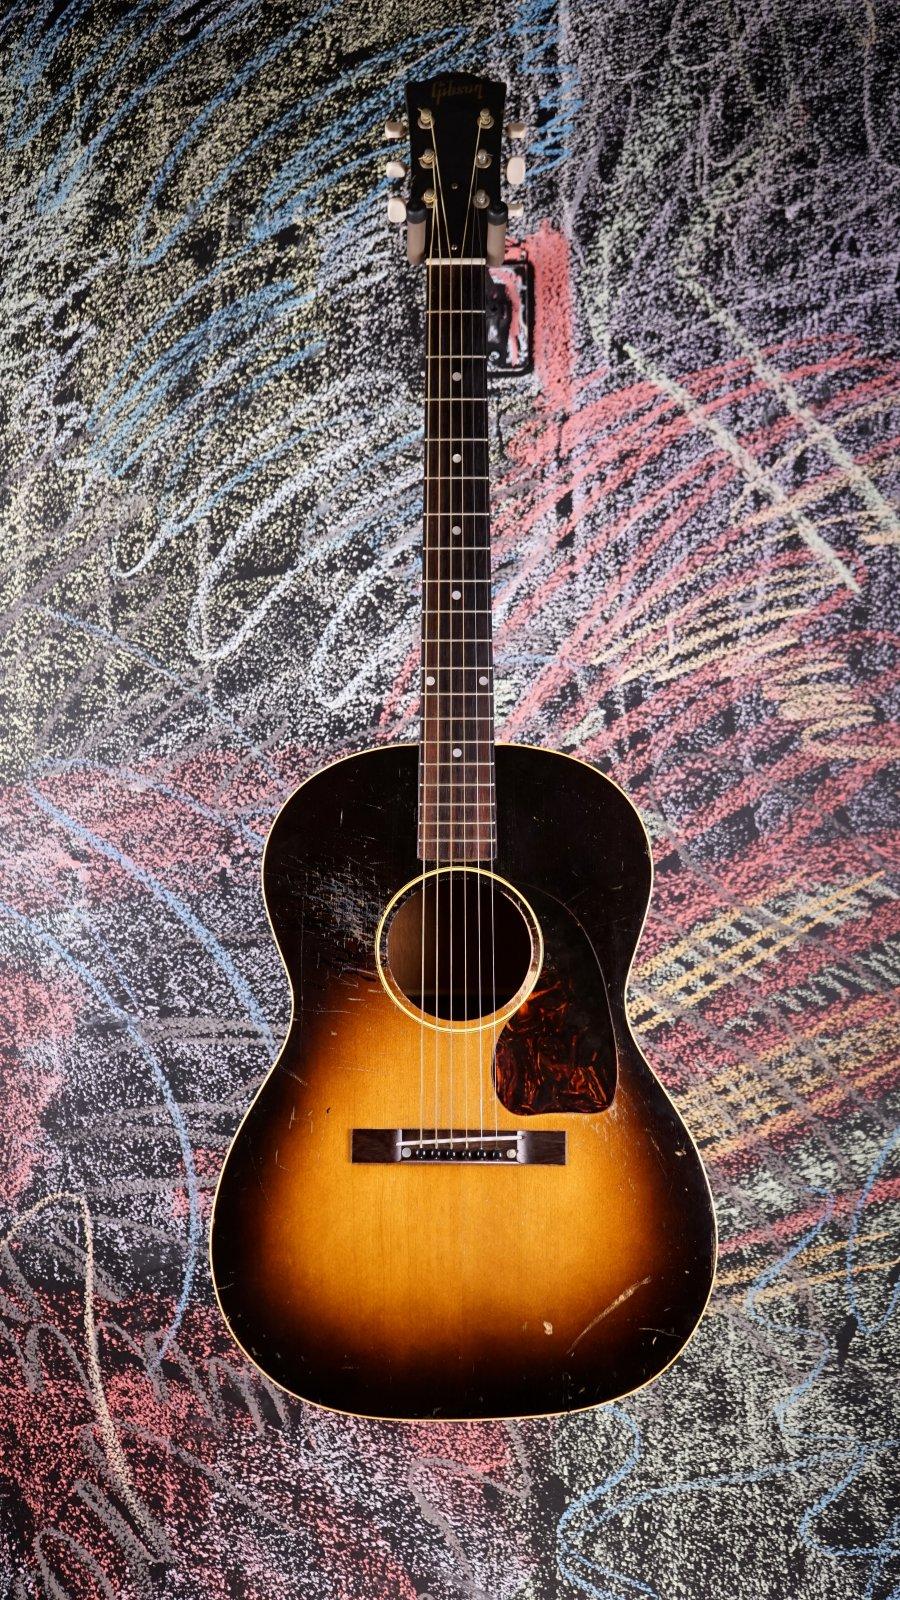 Used 1950 Gibson LG-1